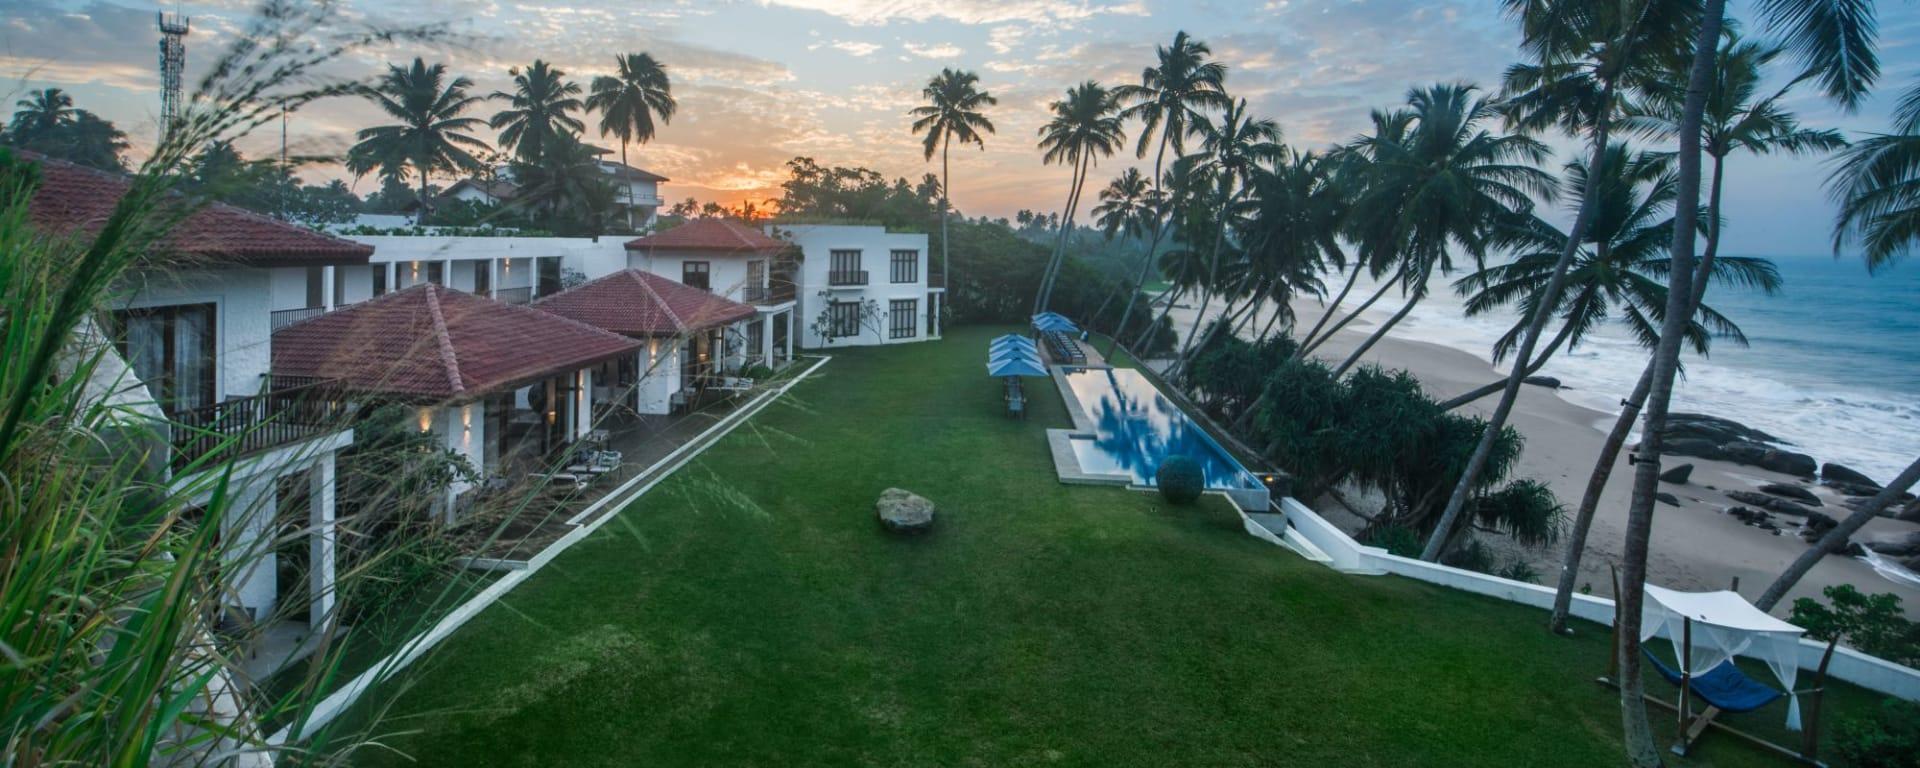 Kumu Beach Hotel à Balapitiya: Property